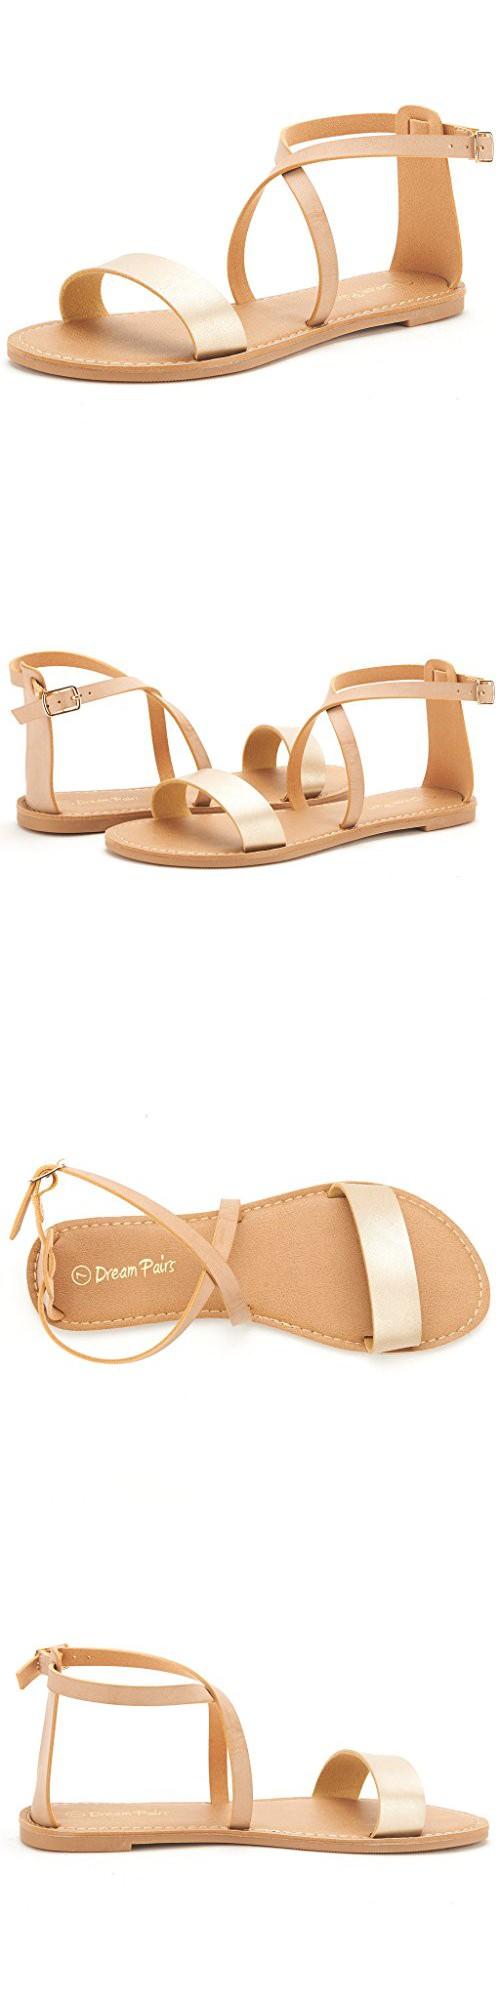 99ce5f2e46d0 DREAM PAIRS CROX New Women Open Toe Fashion Crisscross Valcre Ankle Straps  Summer Design Flat Sandals GOLD-NUDE SIZE 8.5